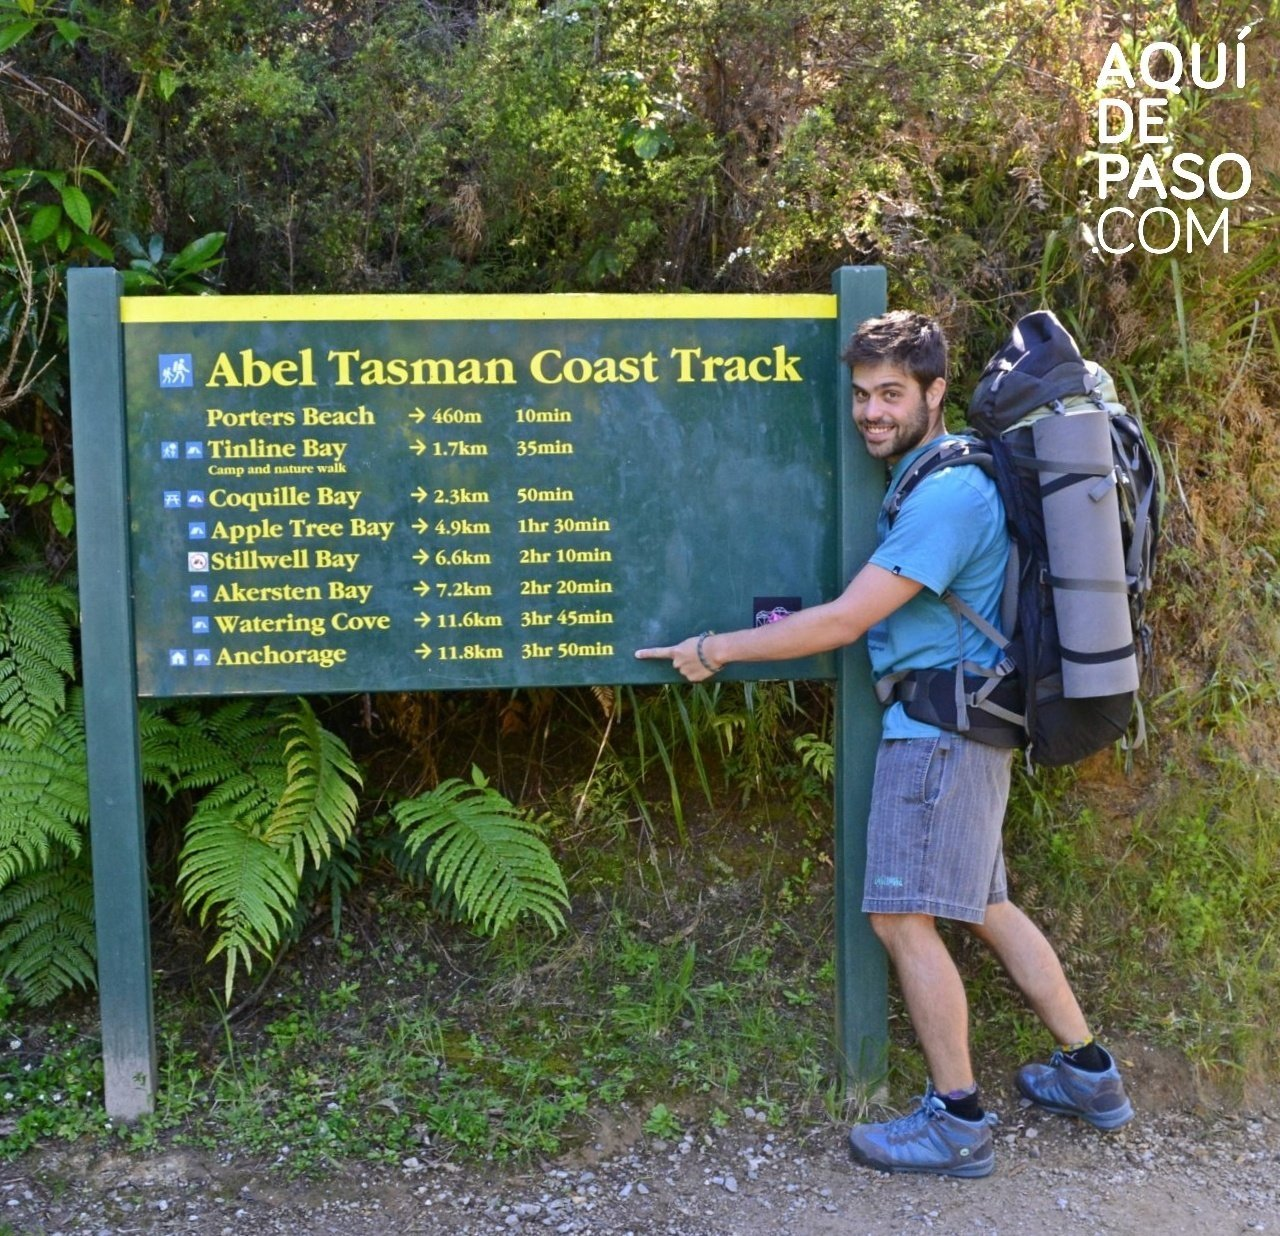 Abel Tasman IV - Aquidepaso.com